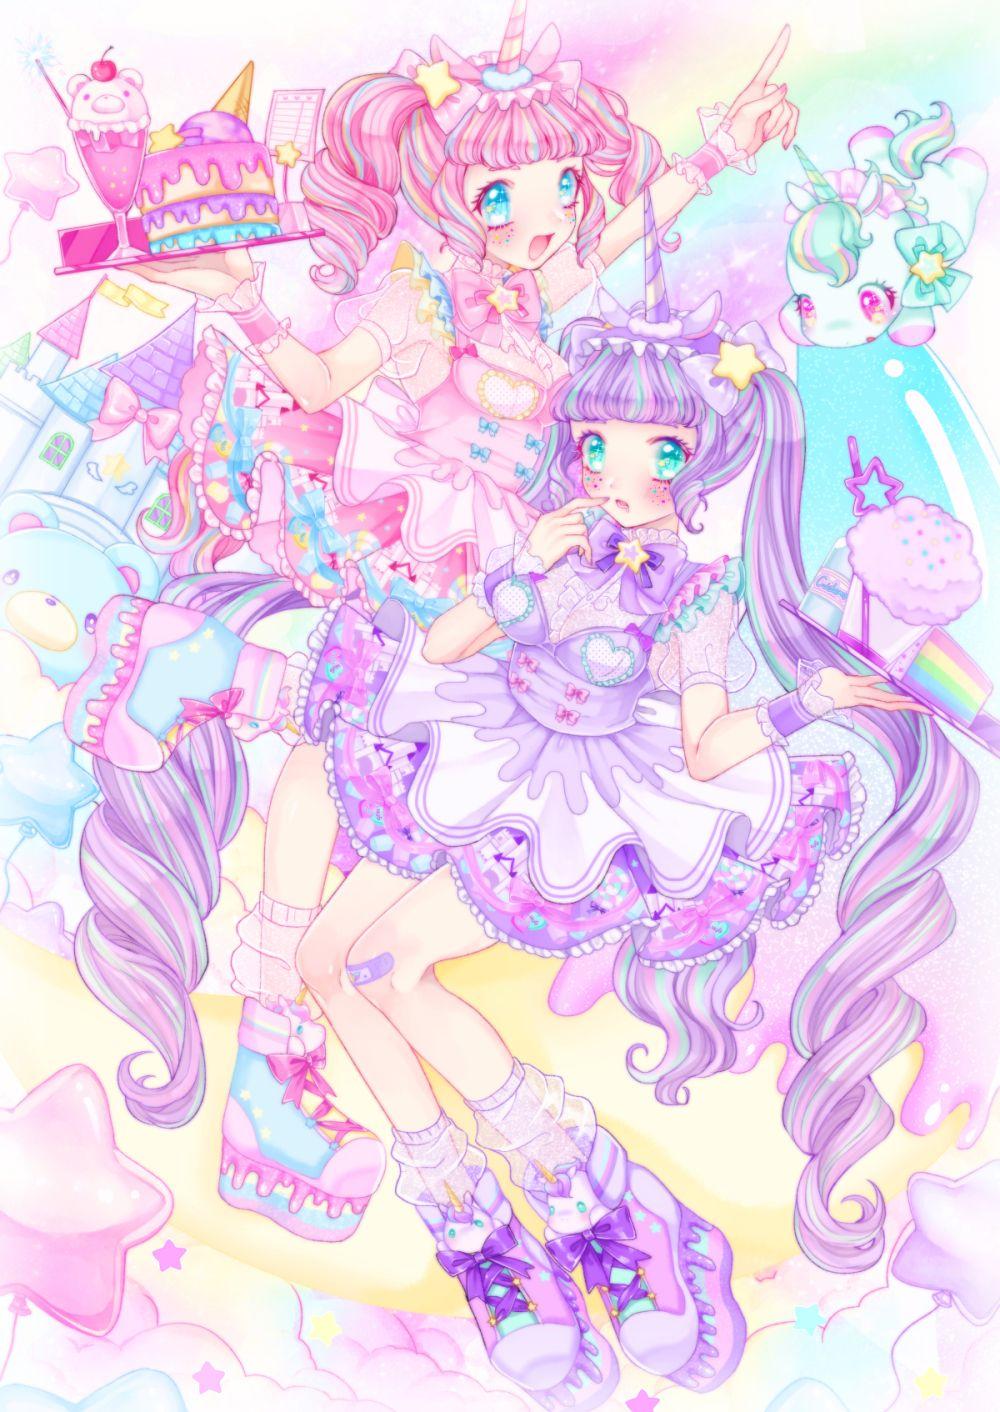 Pin by leyna rikka rebong on PriPara  Anime art girl, Kawaii art